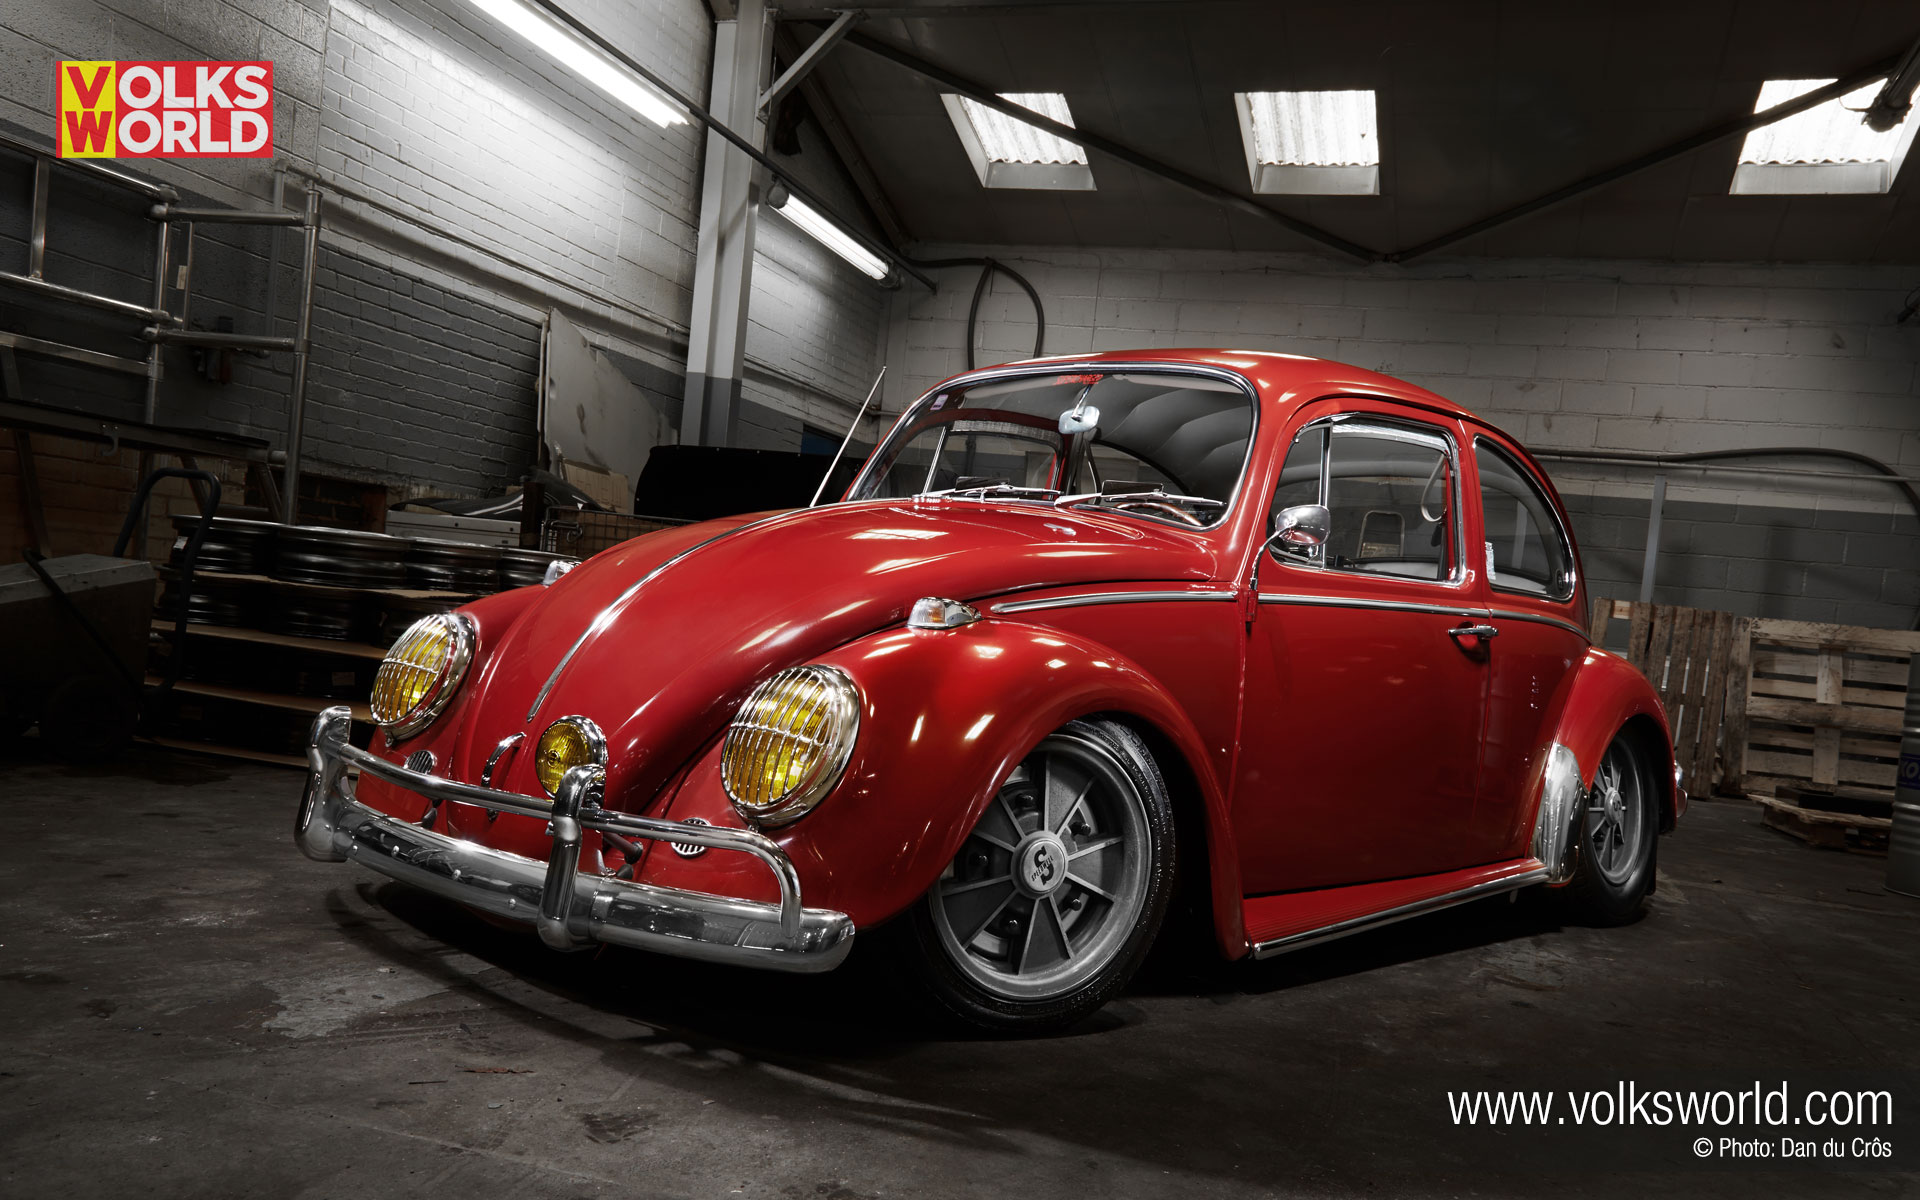 1965 vw bug wallpaper -#main